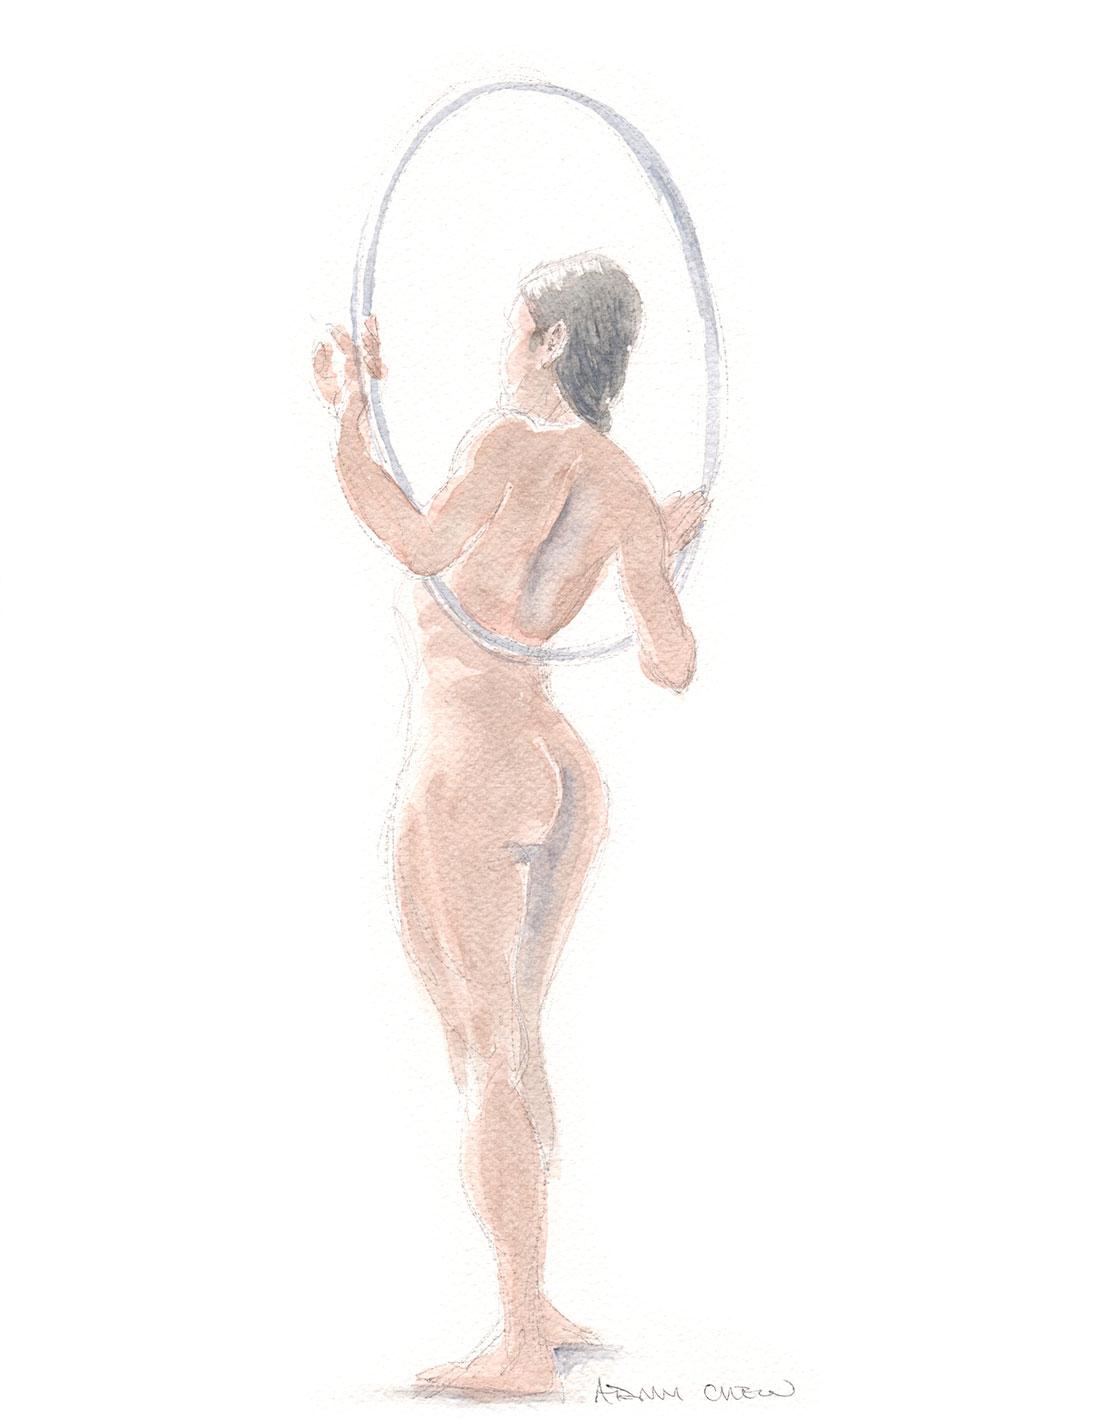 woman hula hoop 2013 - Adam Chew